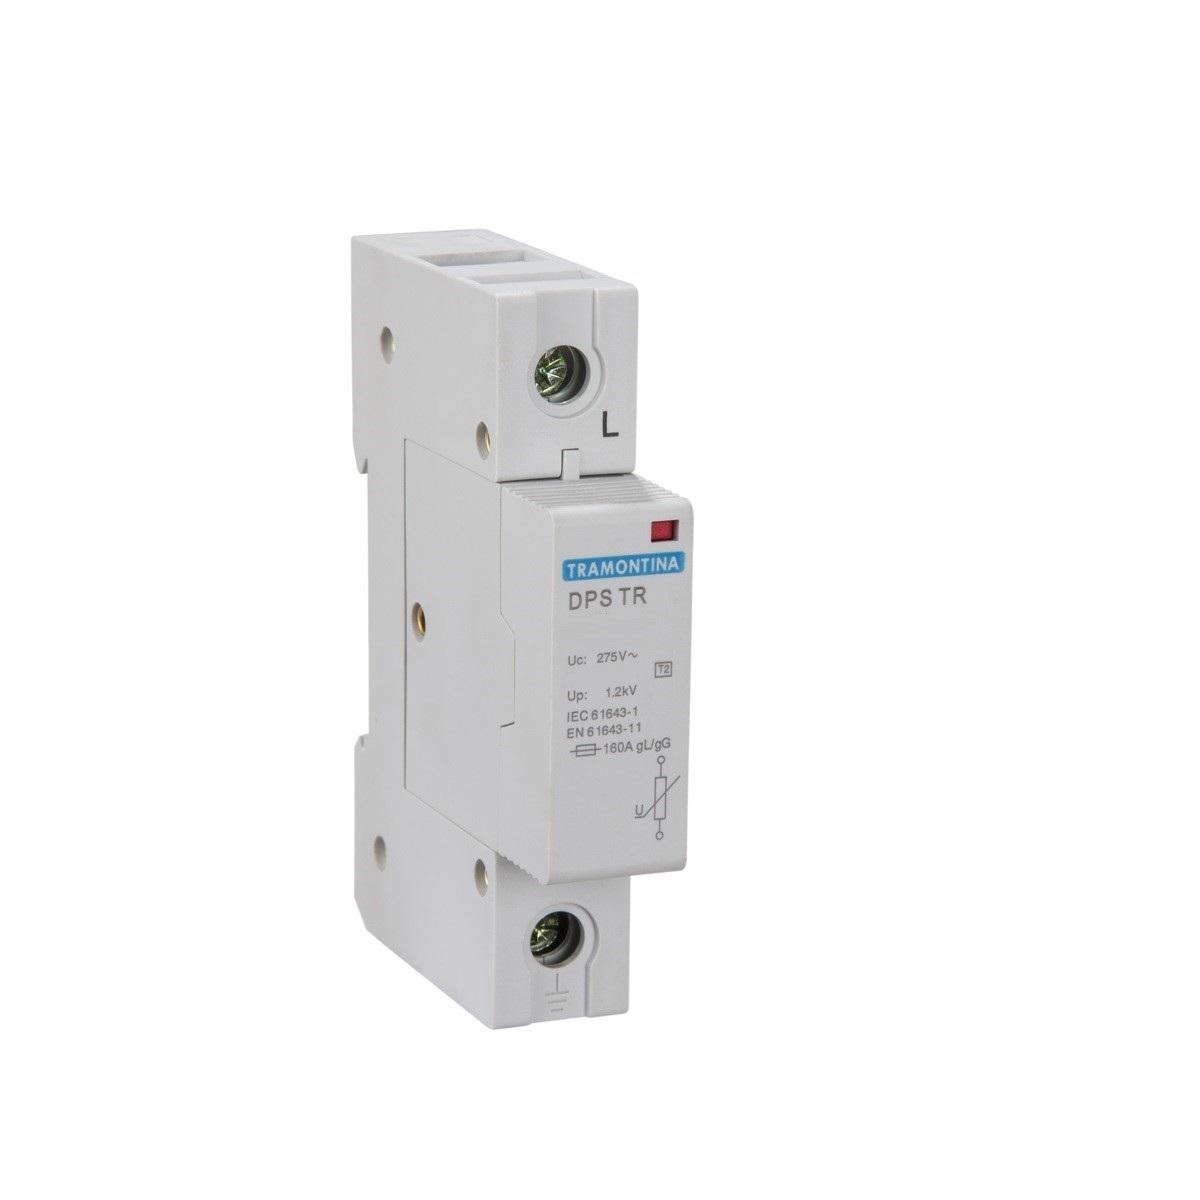 Dispositivo de Protecao contra Surto Eletrico DPS Classe II 15Ka 57700011 - Tramontina